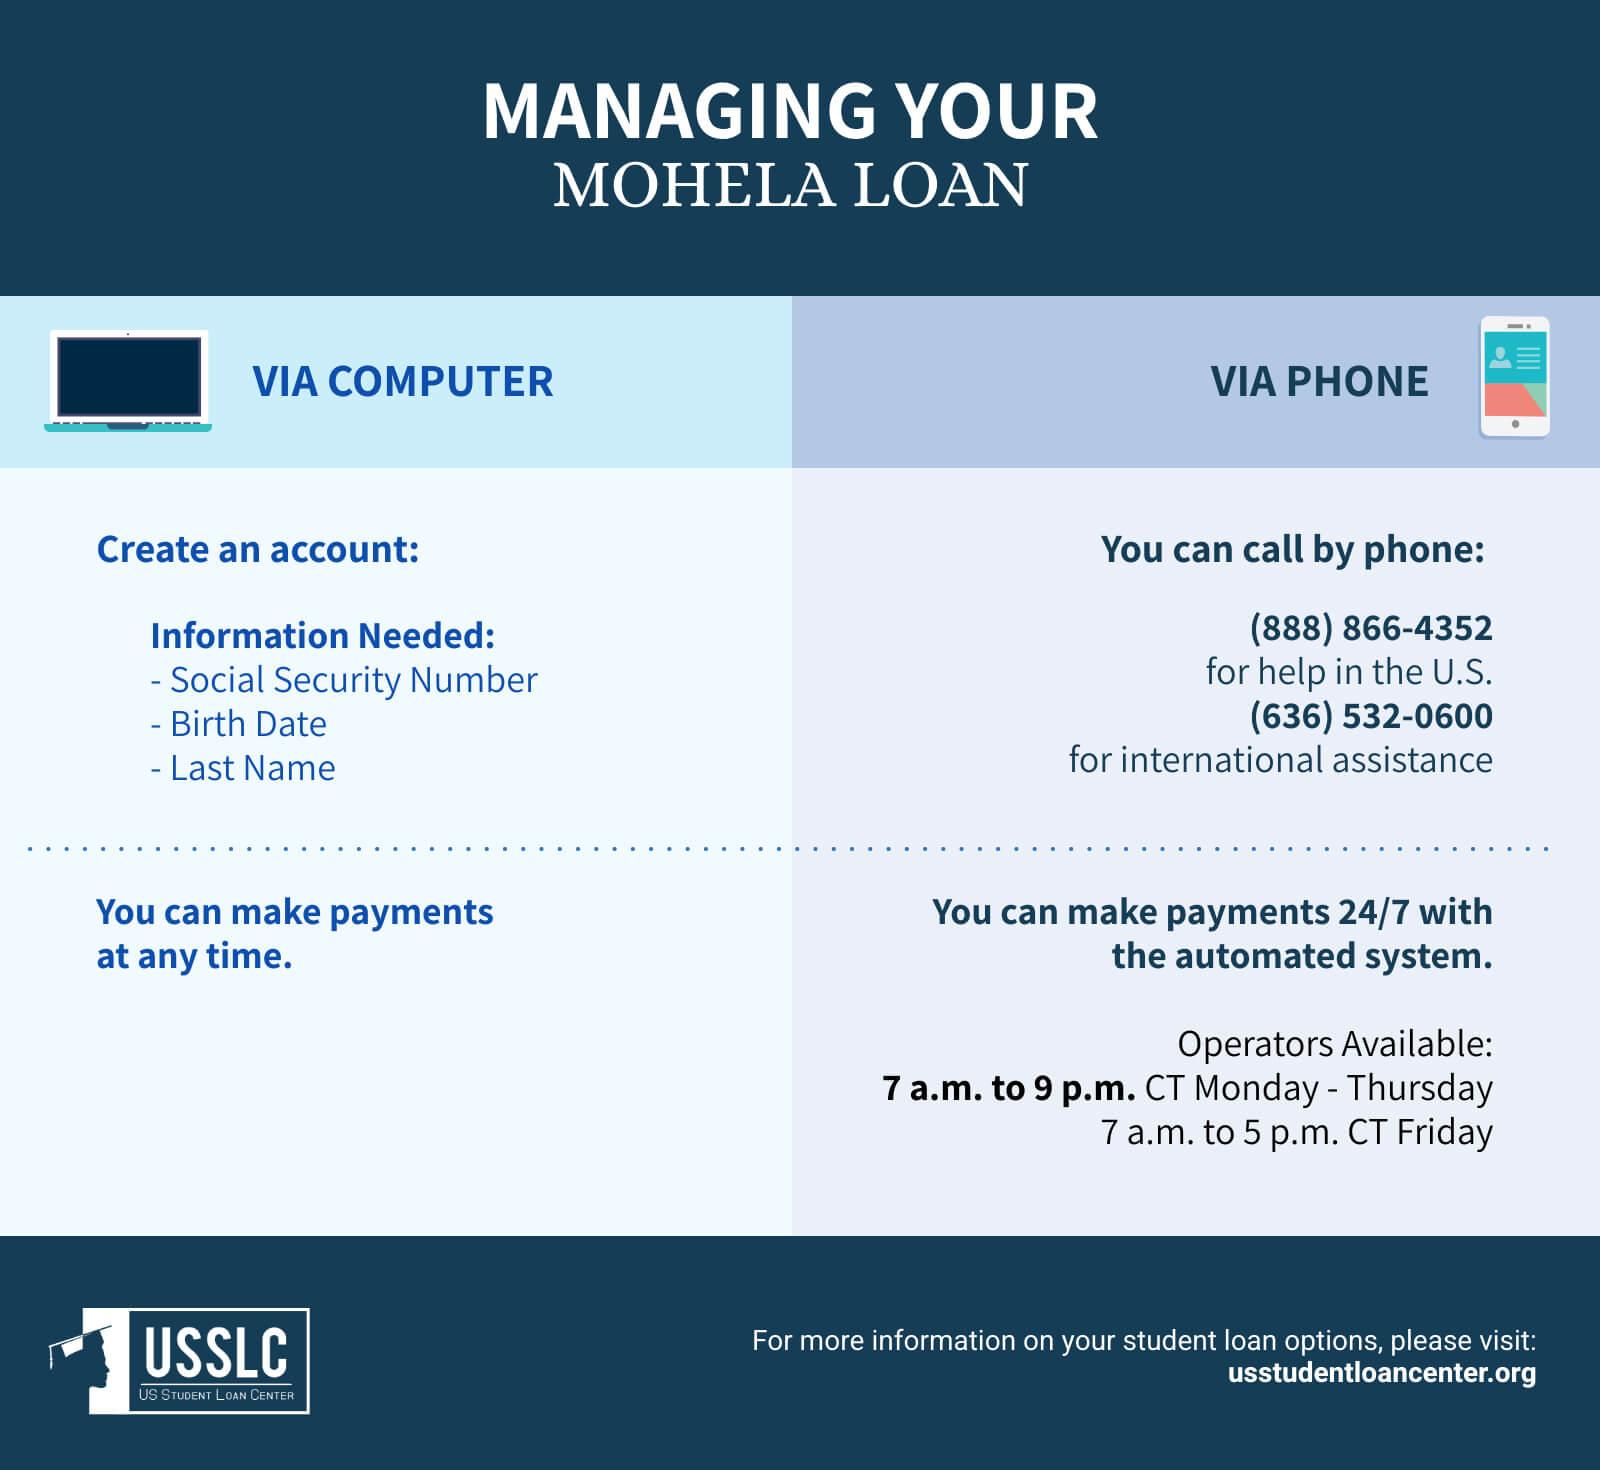 Managing your Mohela Loan - 1